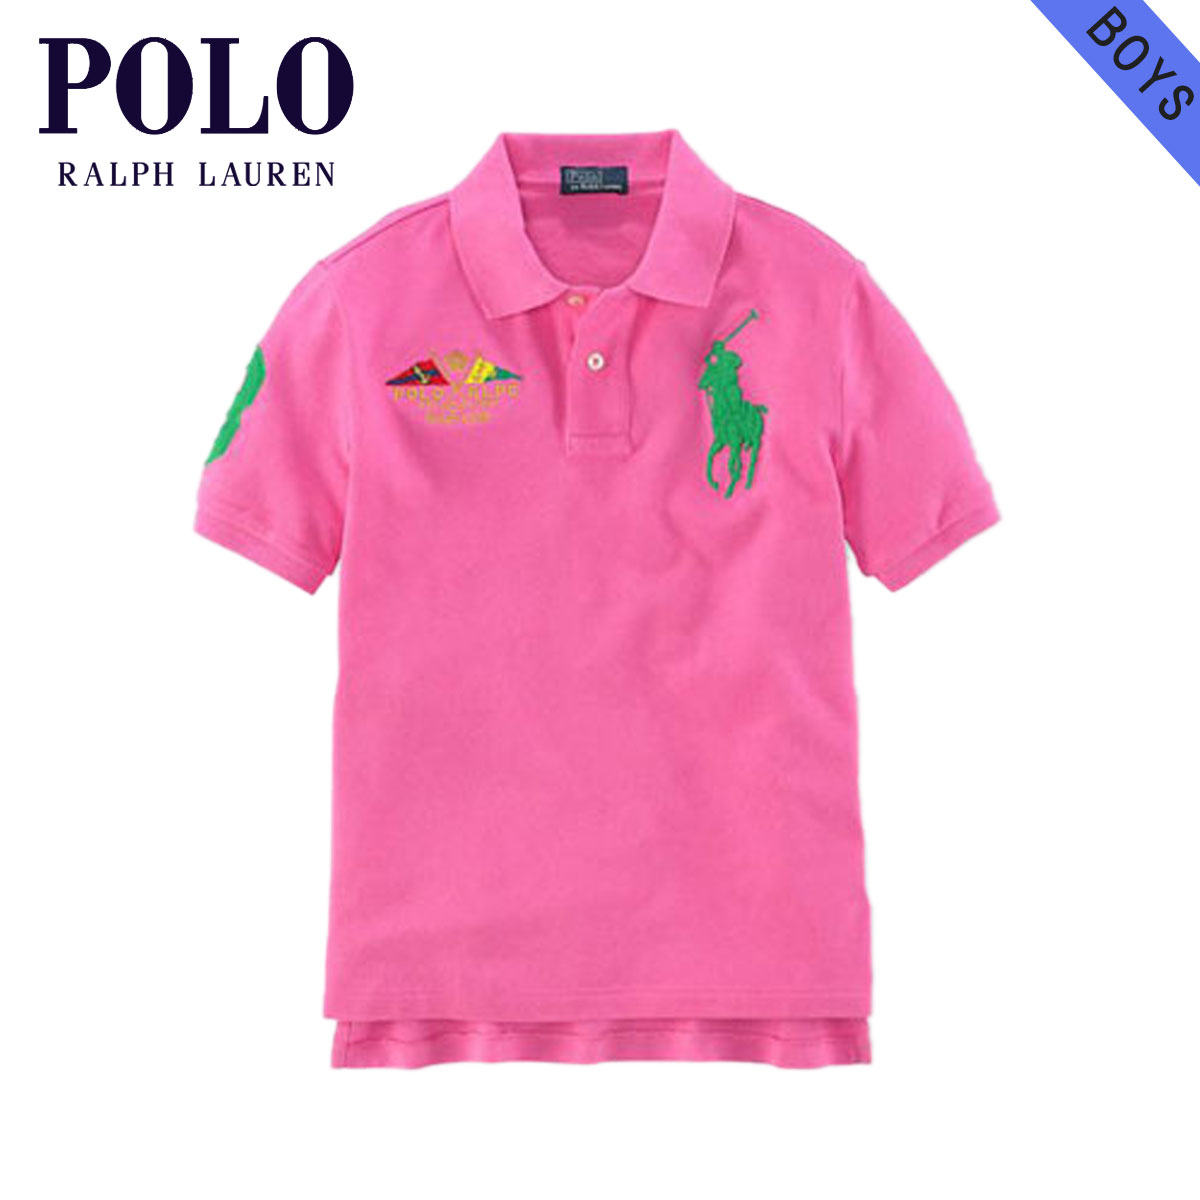 63de96a7dfda Poloralflorenkids POLO RALPH LAUREN CHILDREN genuine kids clothing boys Polo  Shirt Big Pony Flag Polo  18121136 PINK 10P21Feb15